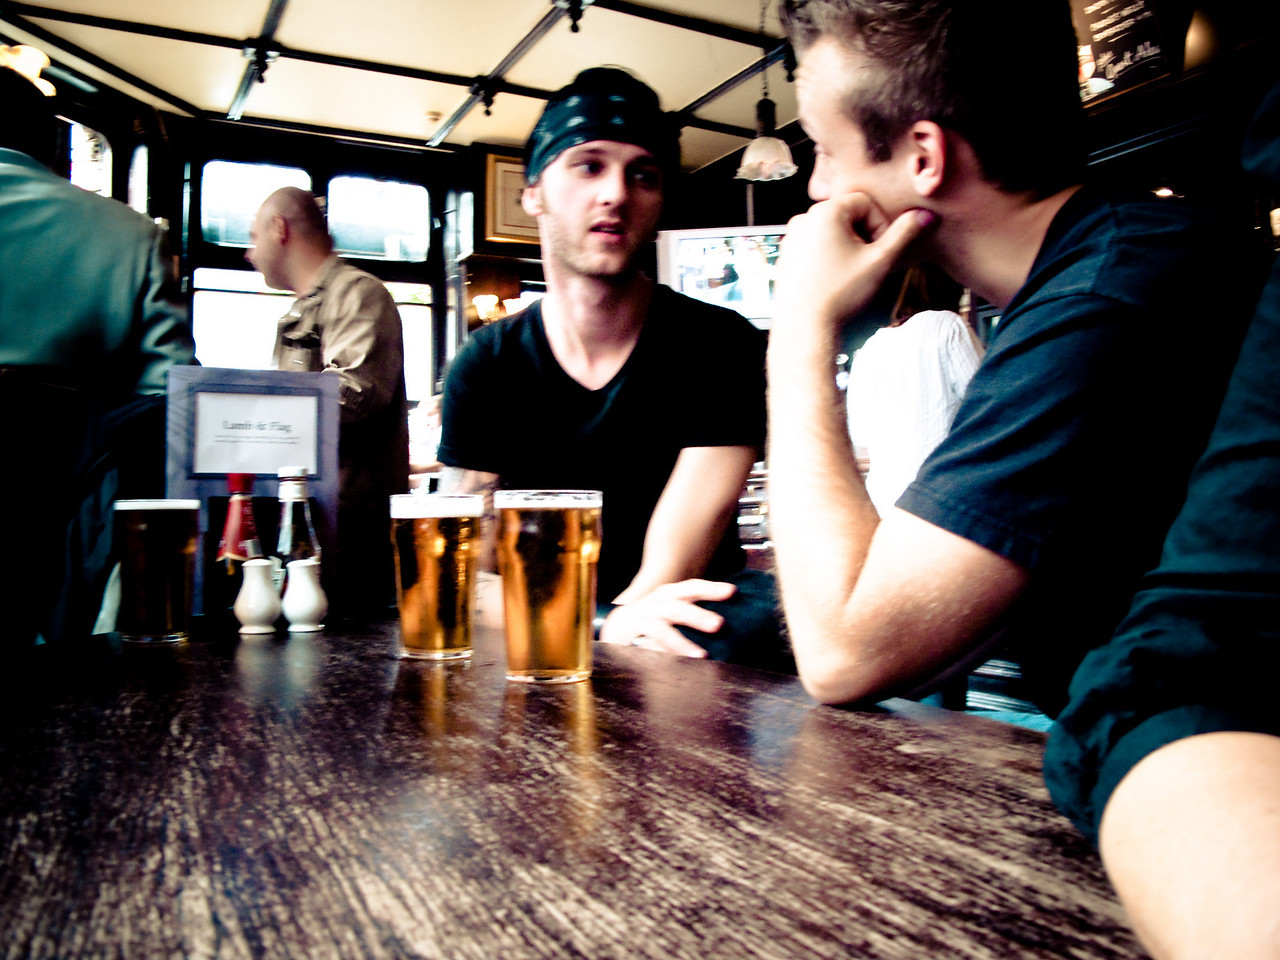 Germans in a Pub - London